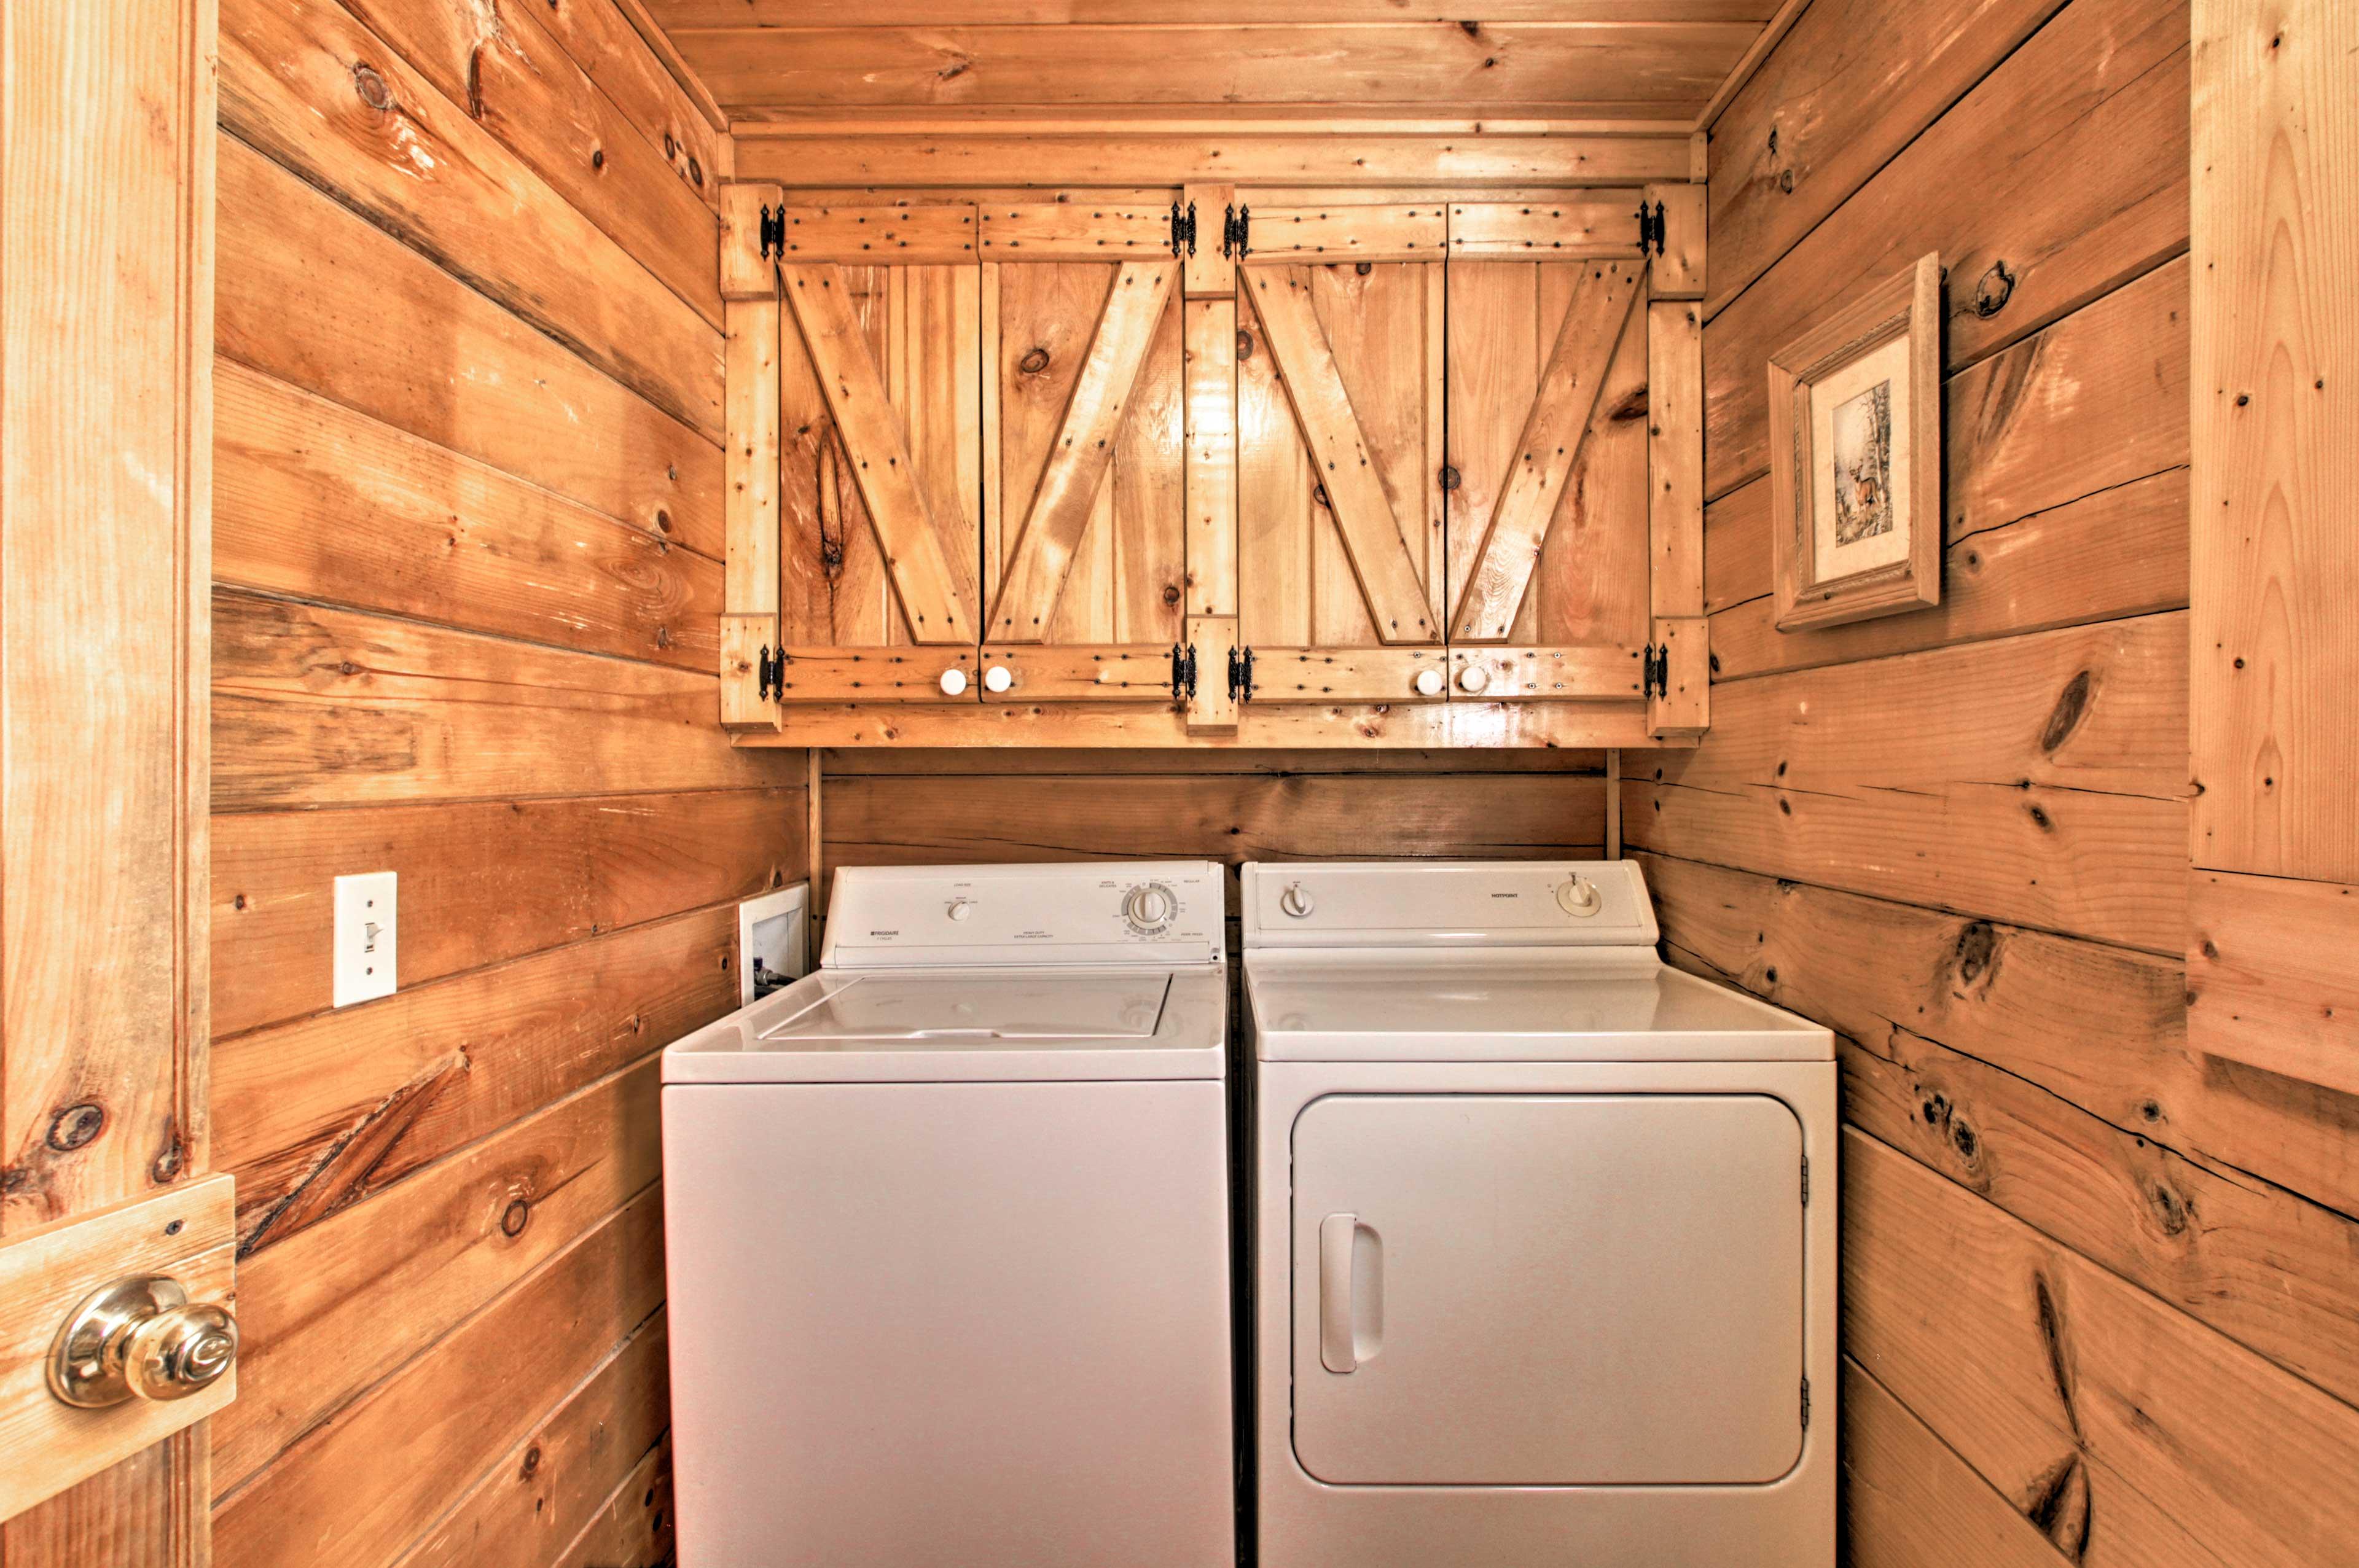 En-Suite Bathroom | Detergent Provided